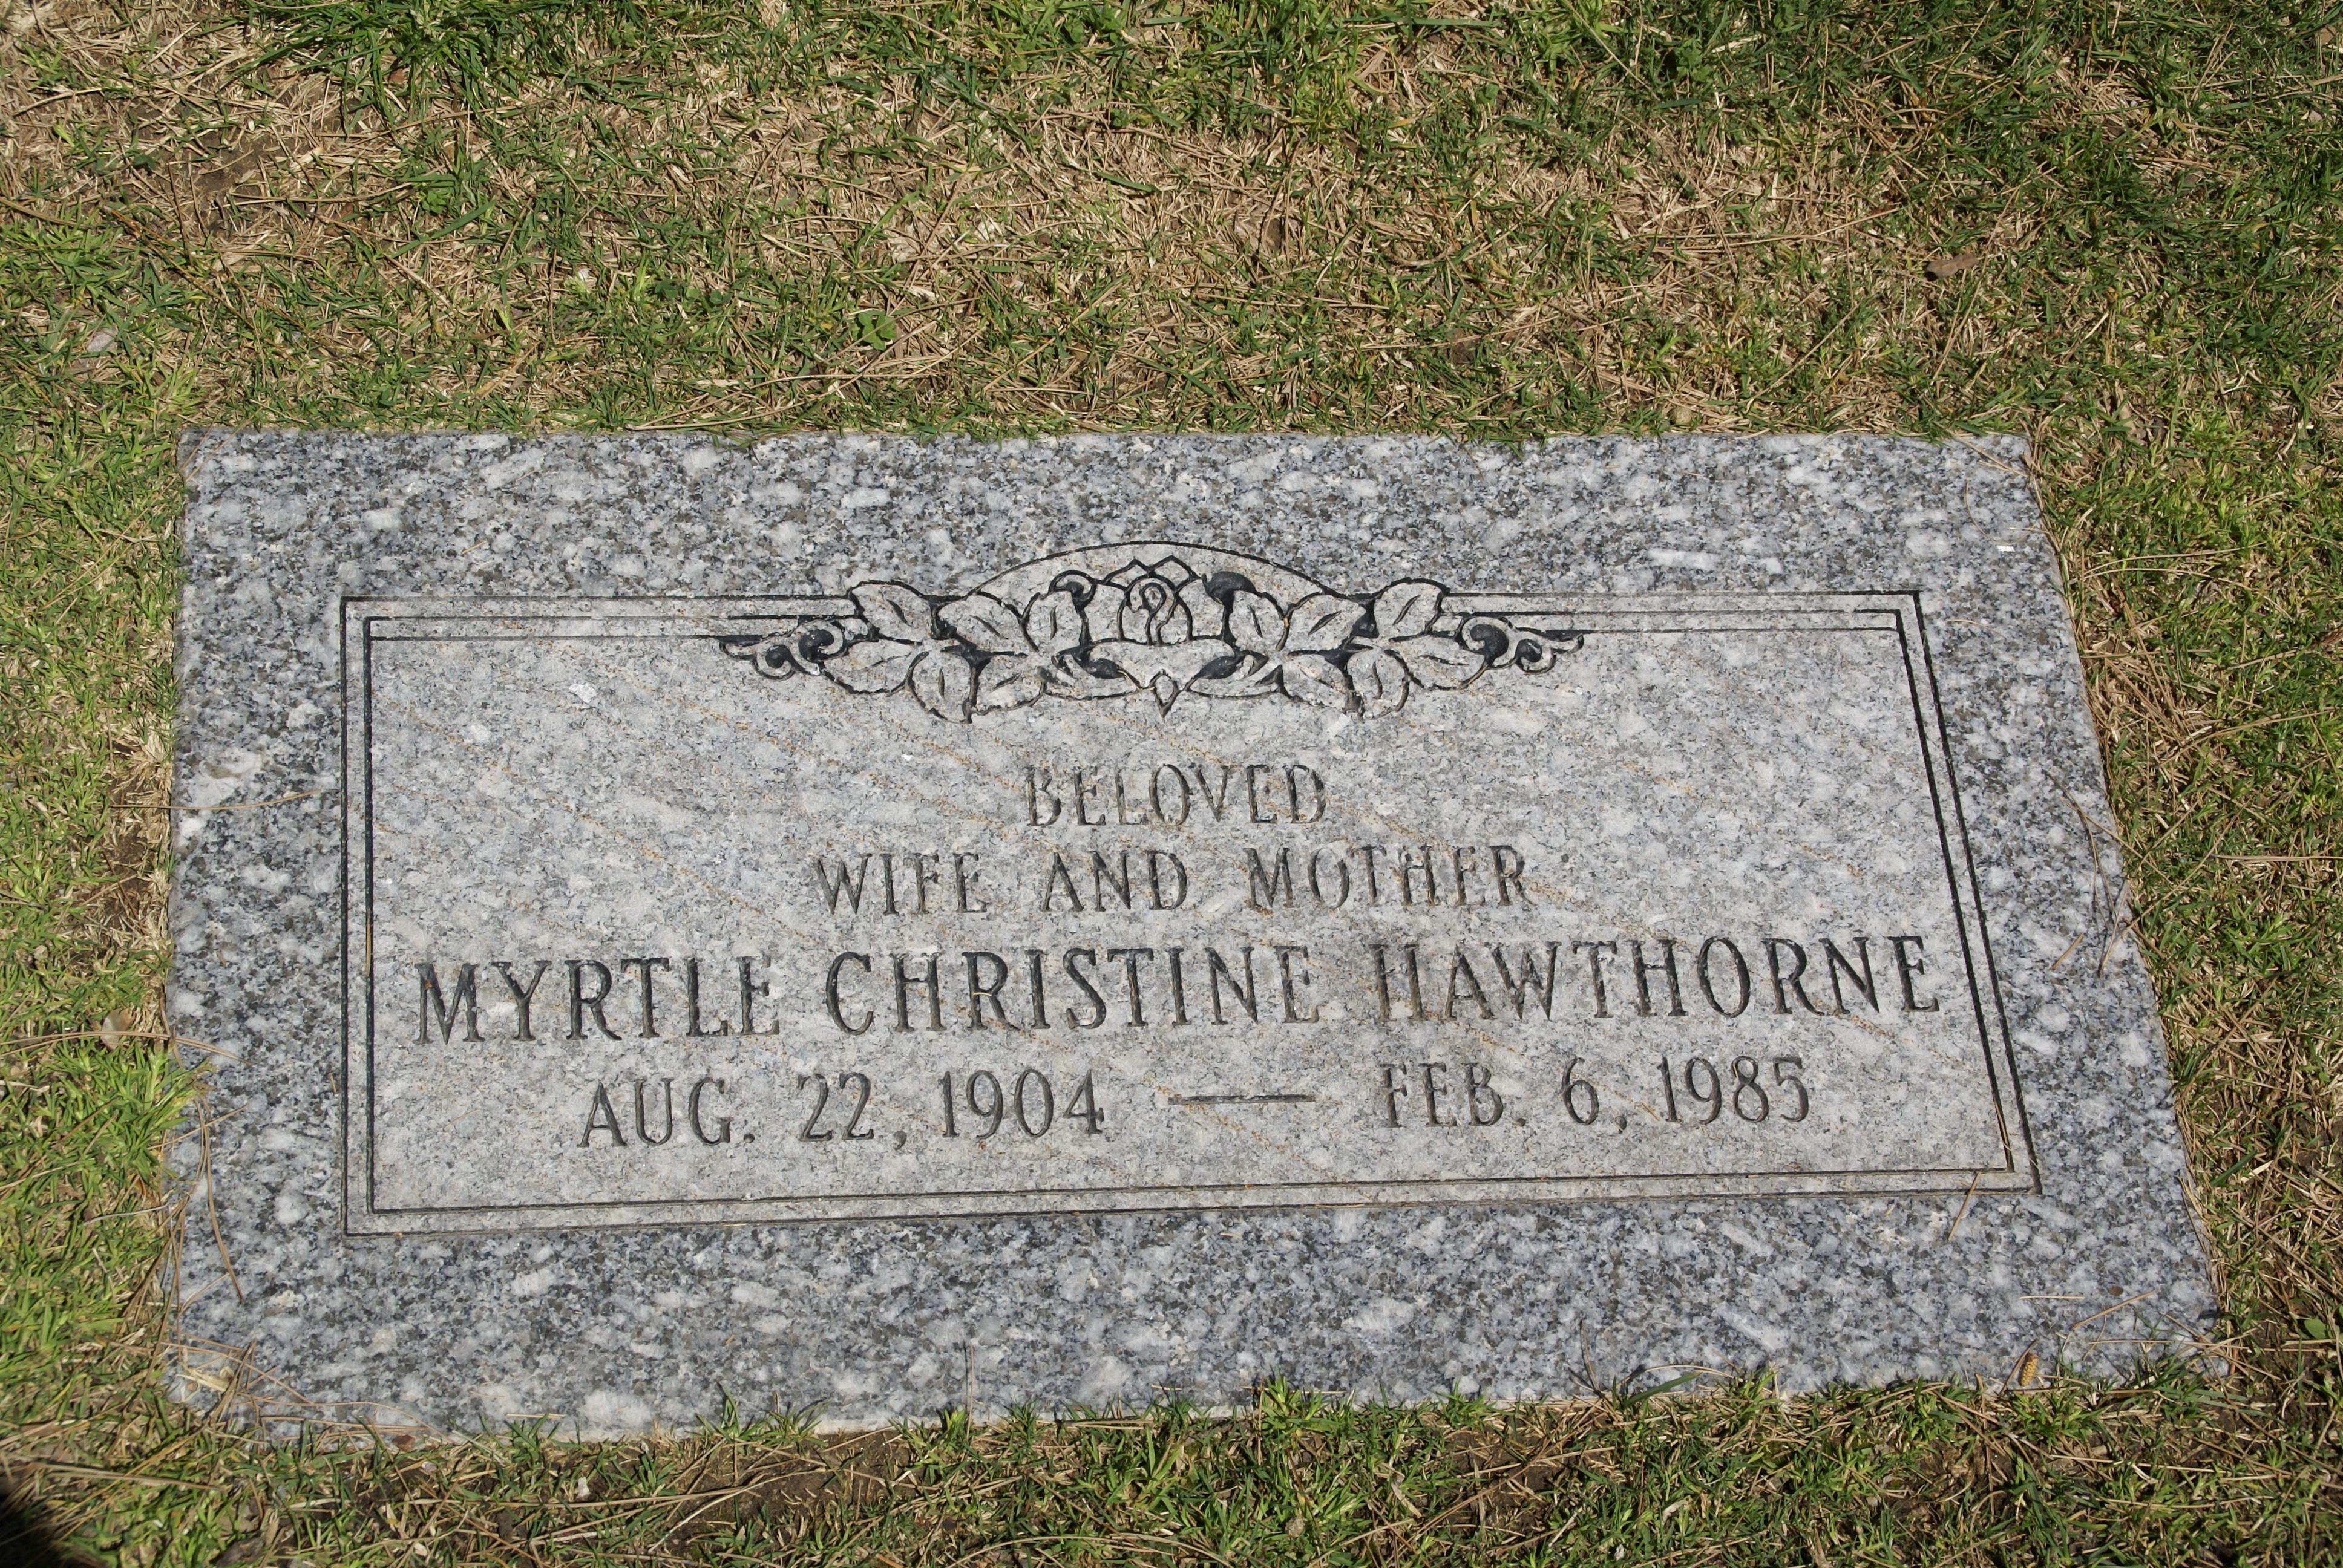 myrtle-christine-hawthorne-marker